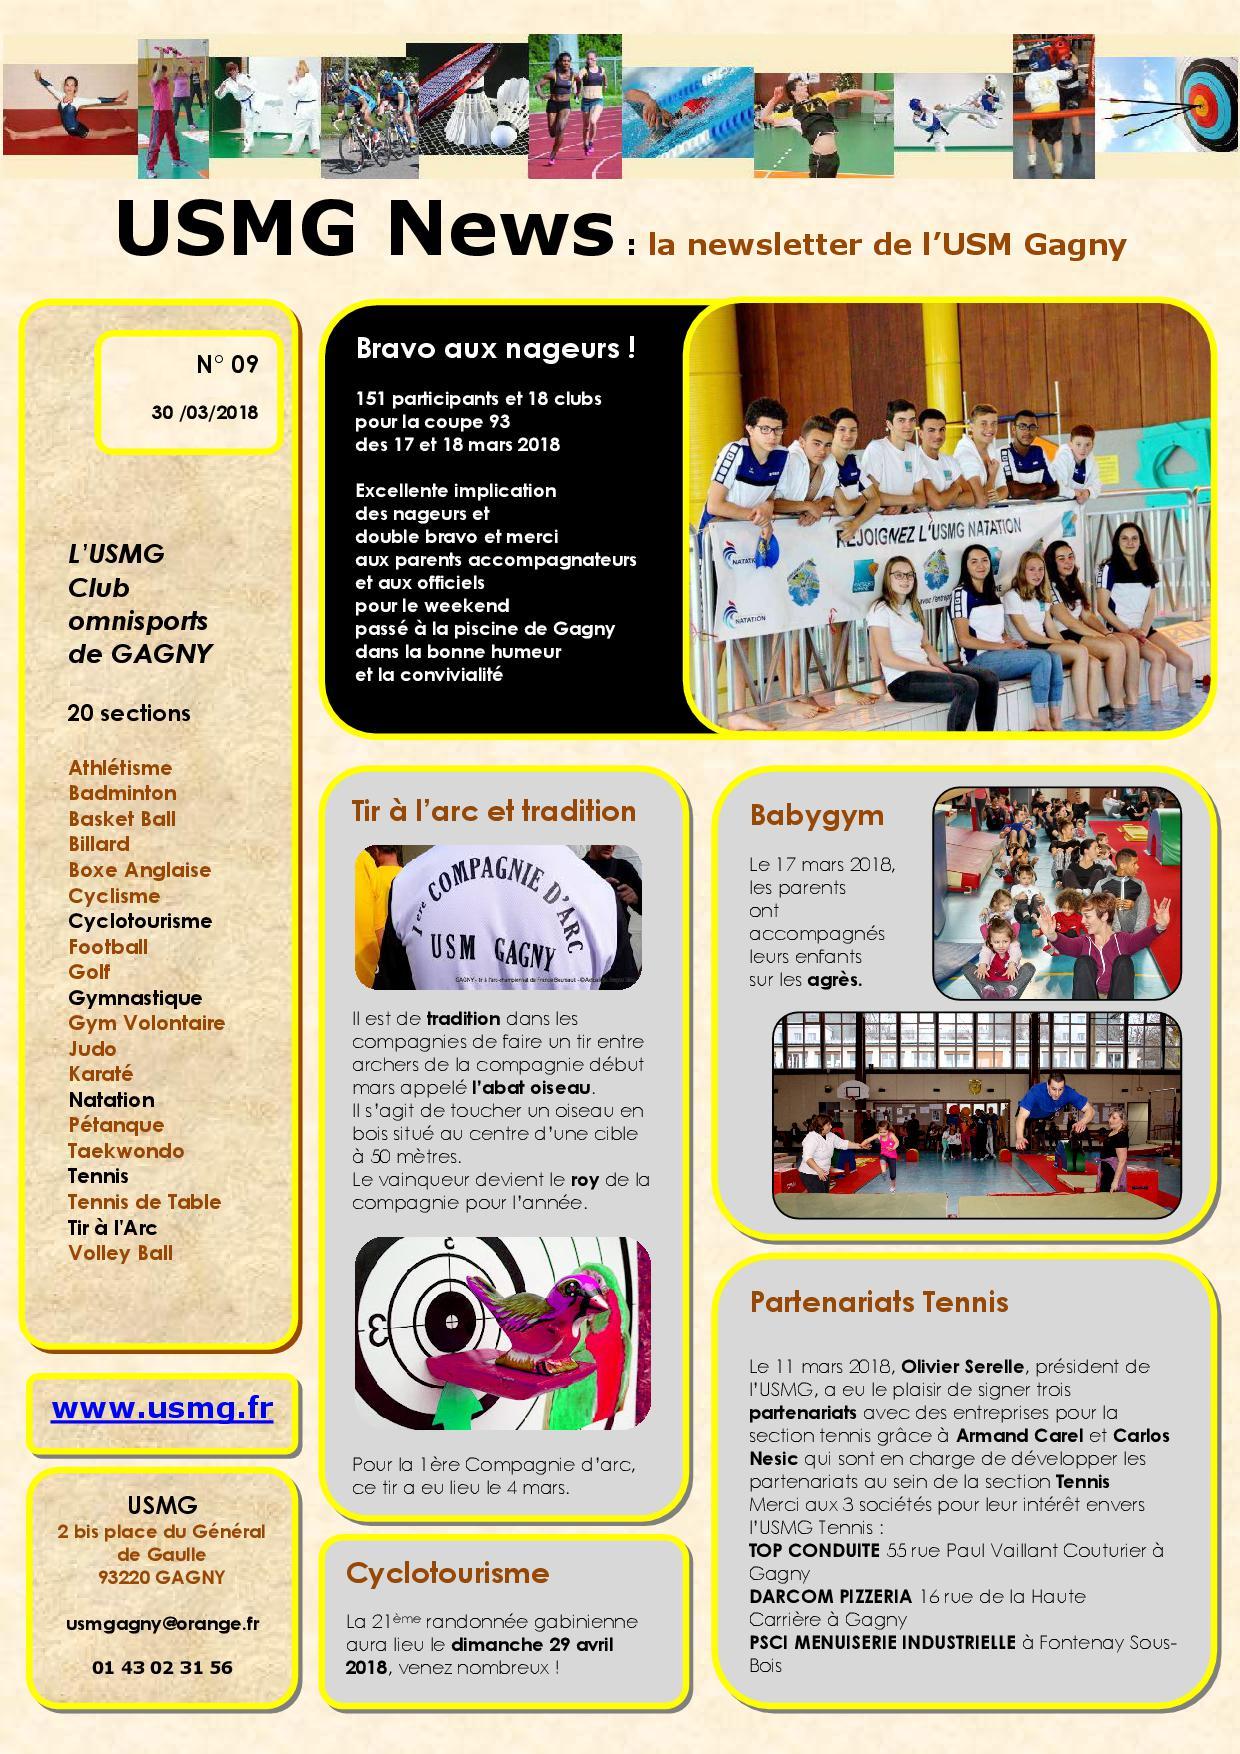 Usmg news 09